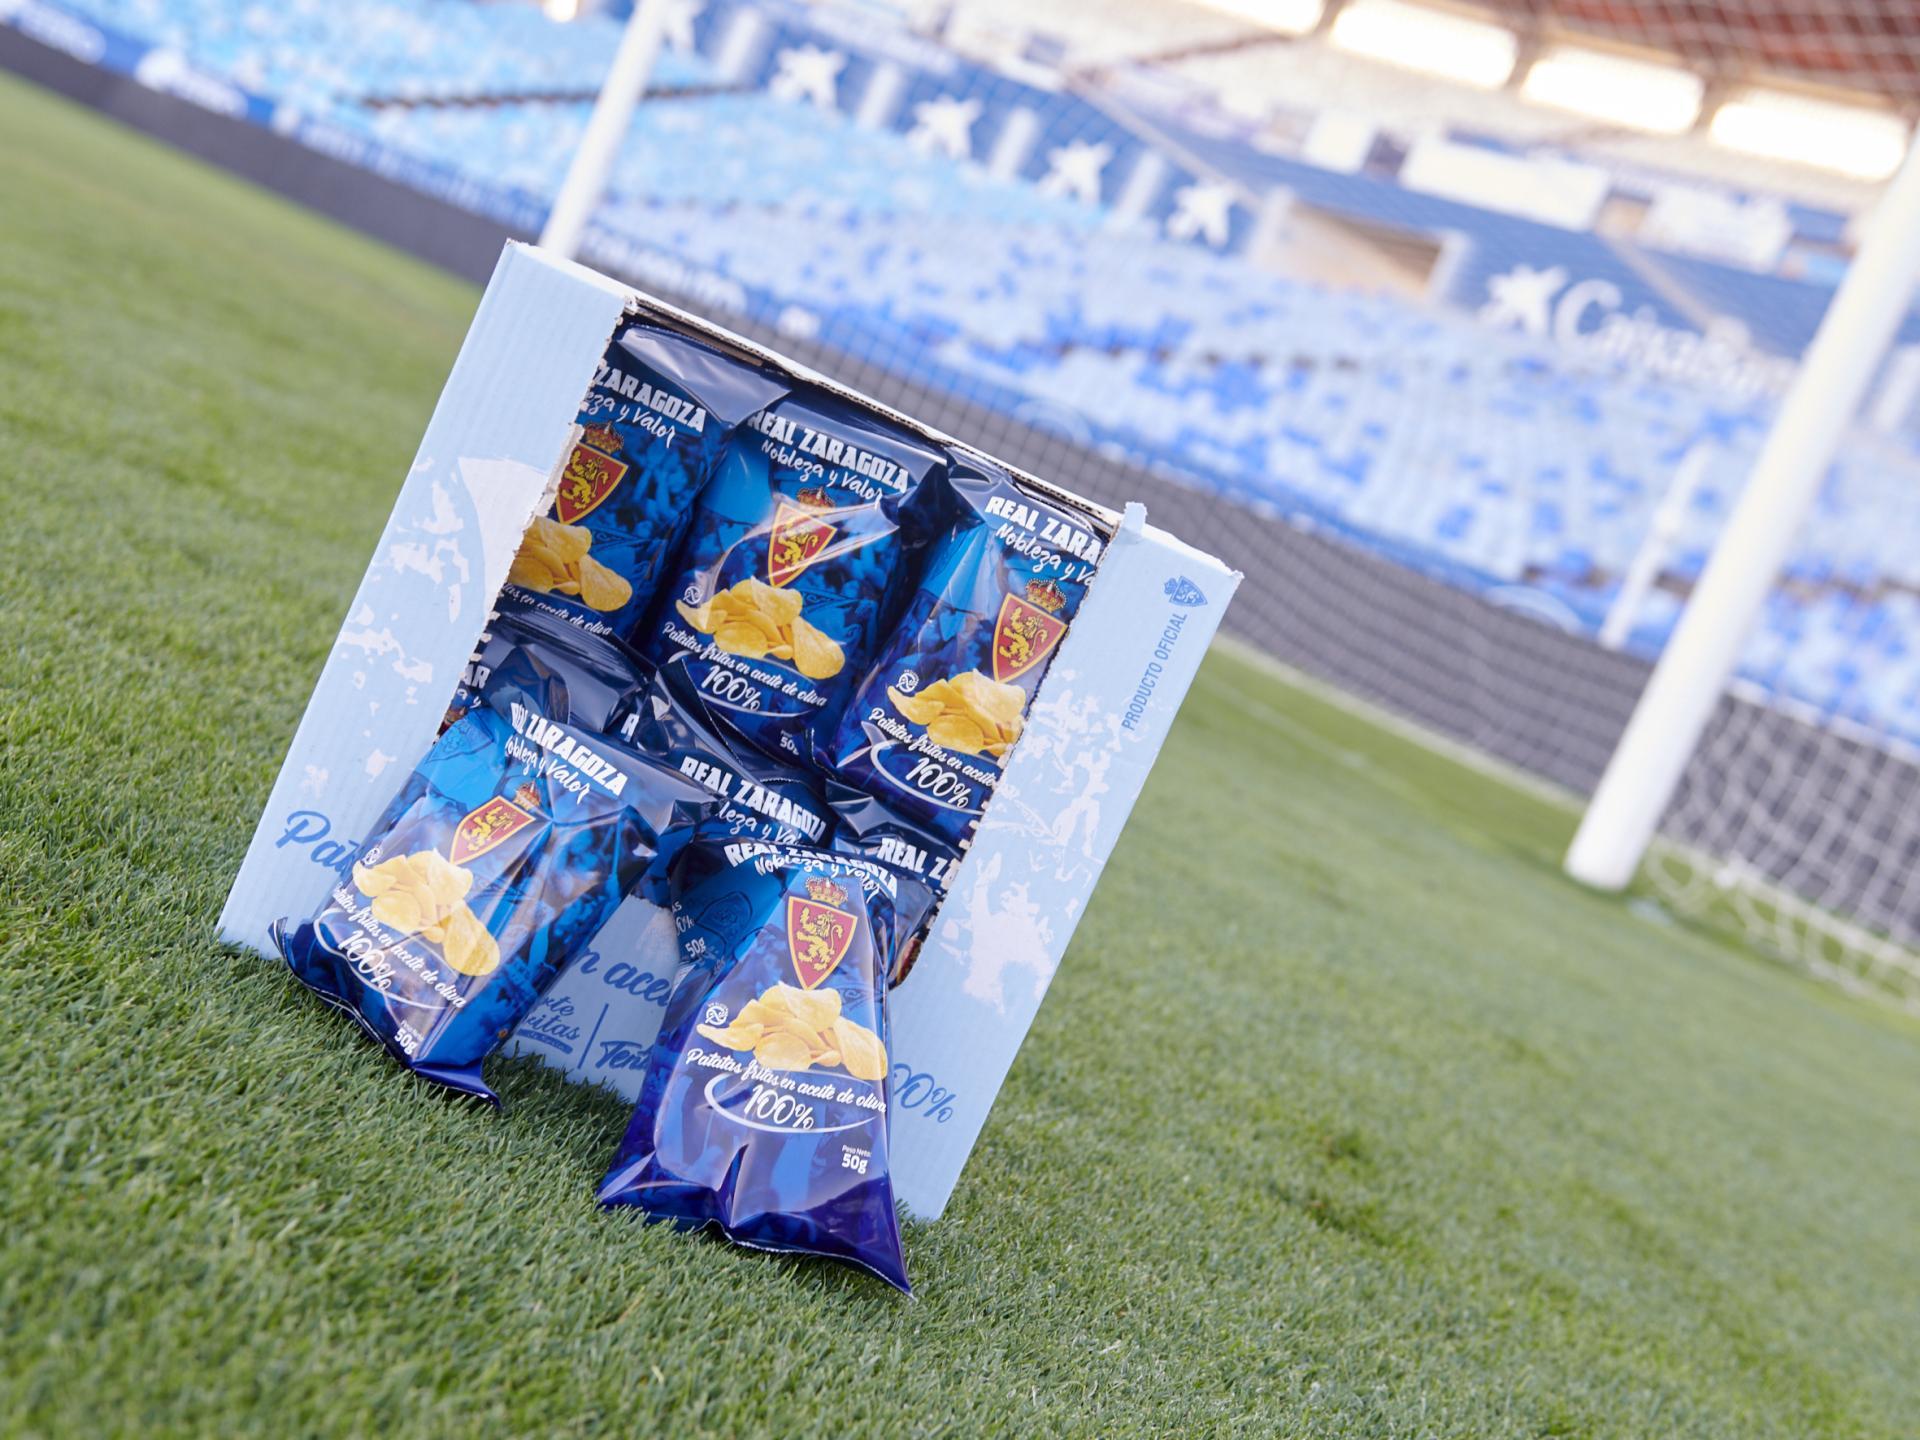 Patatas fritas Real Zaragoza (caja de 24 bolsas)